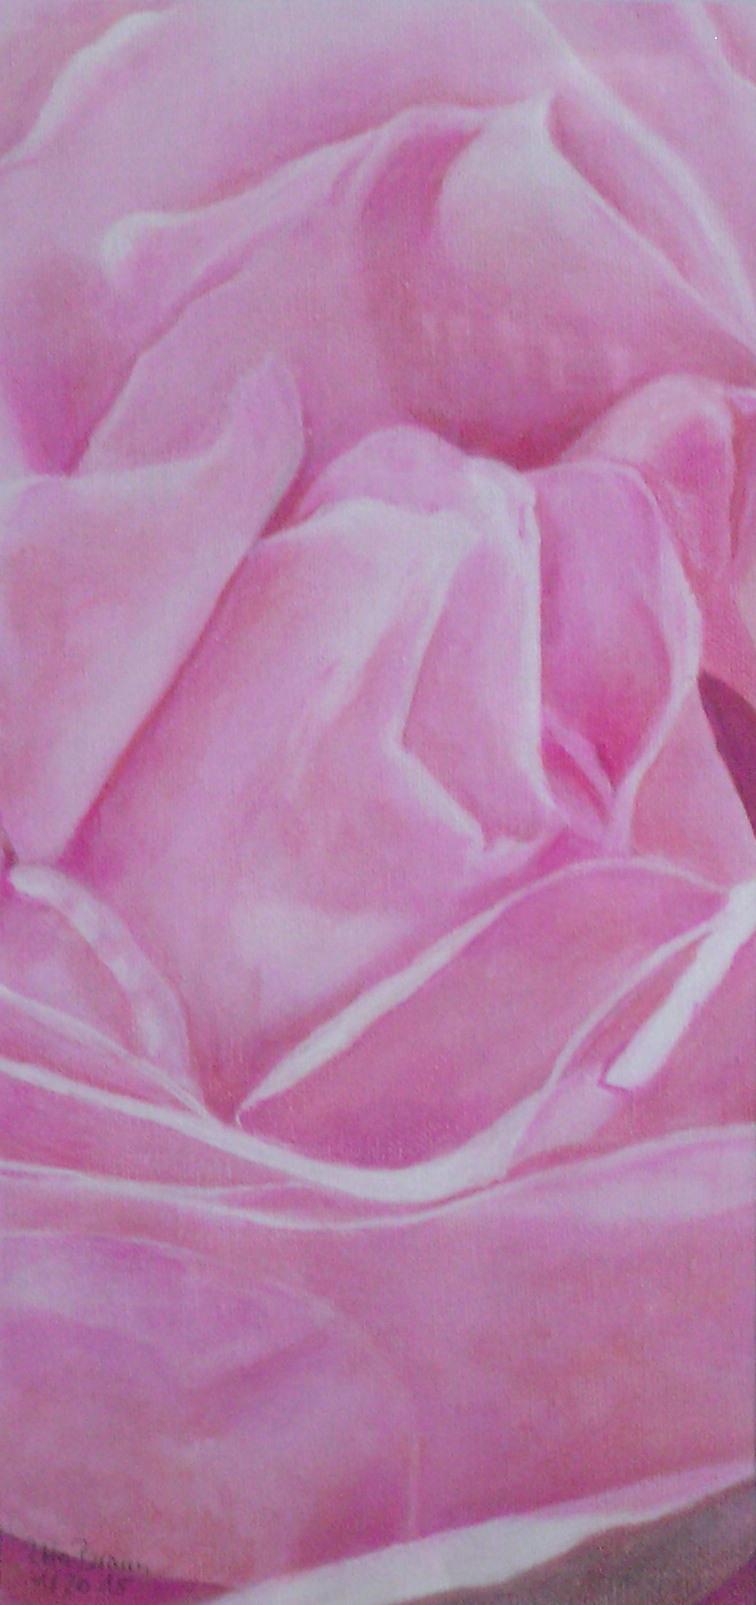 Blütenstruktur rosé- Septemberrose